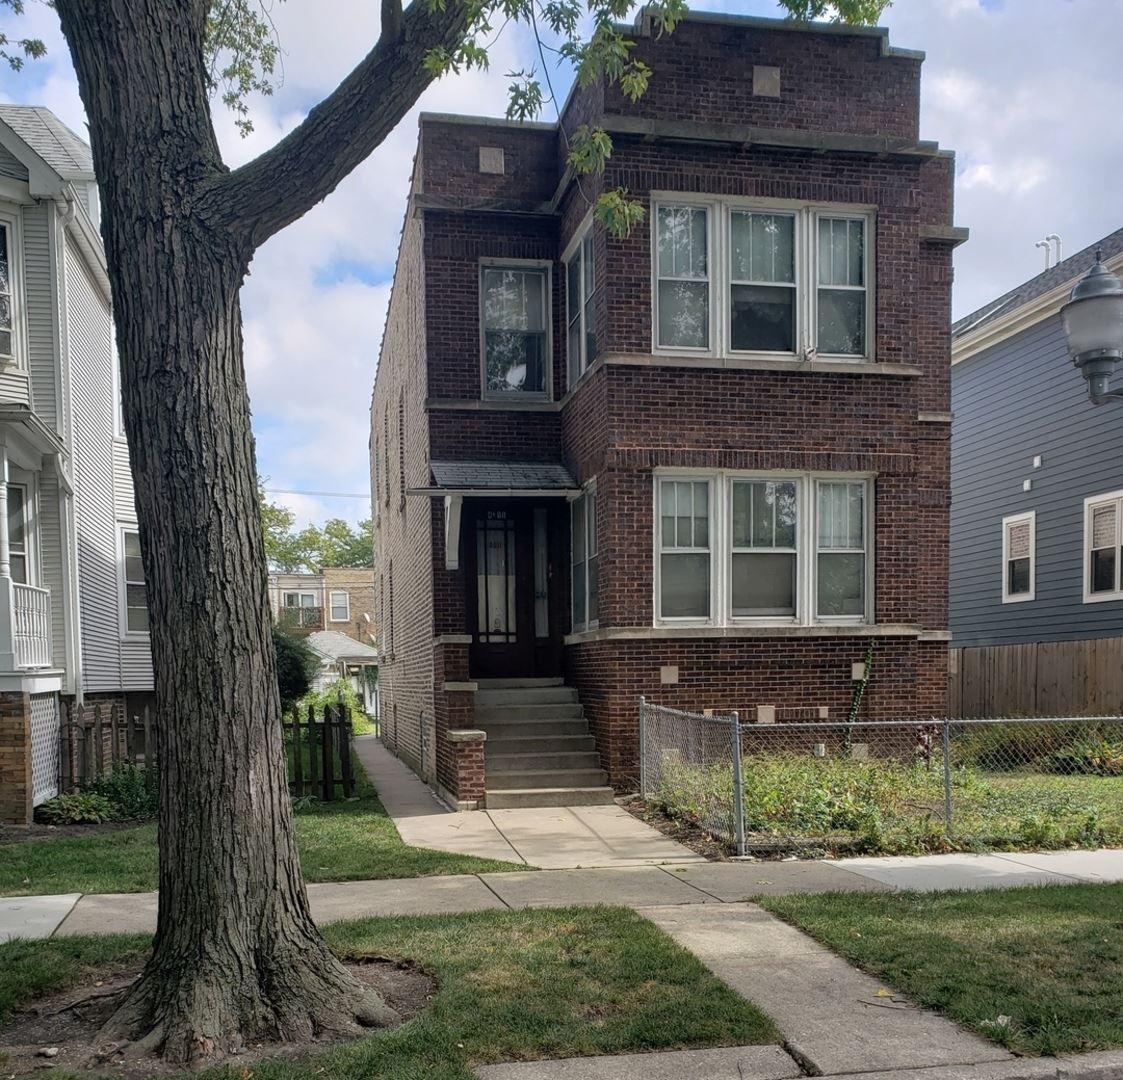 4311 N Whipple Street, Chicago, IL 60618 - #: 11246090